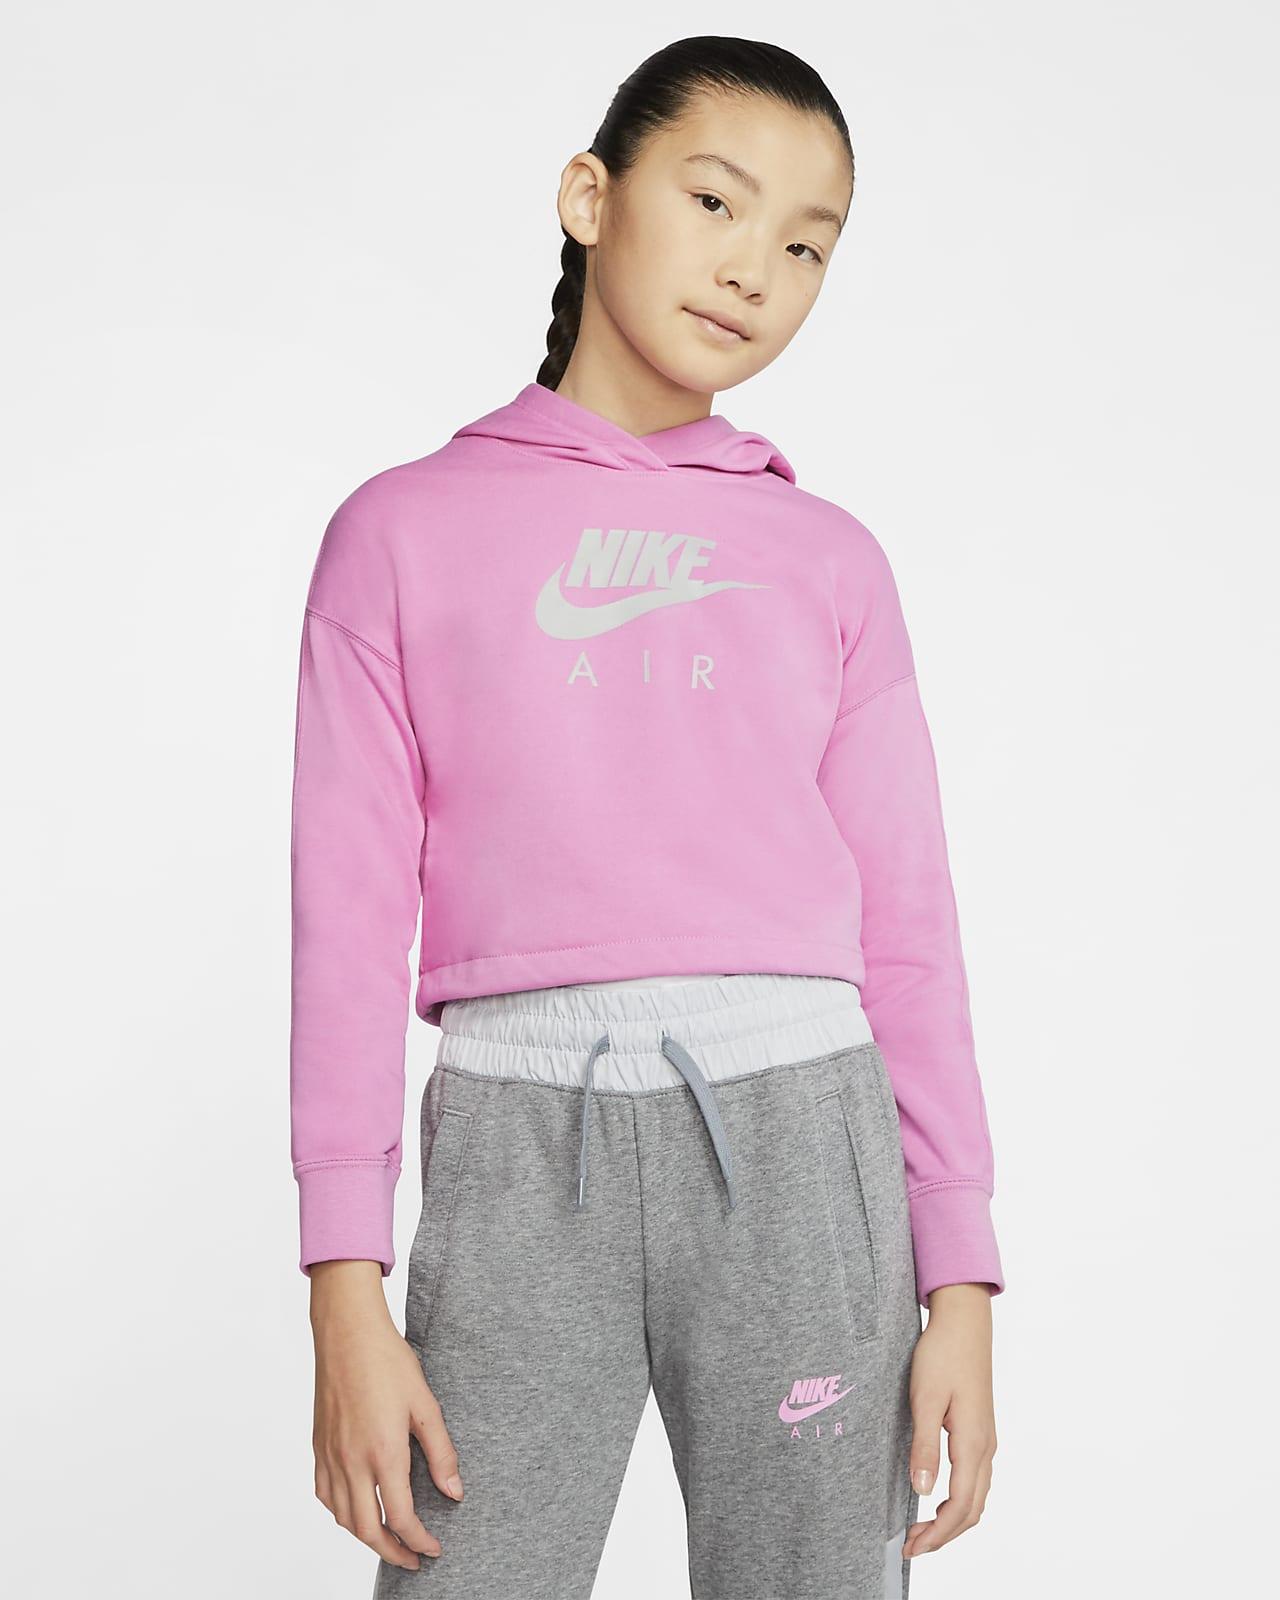 Nike Air Dessuadora amb caputxa curta - Nena